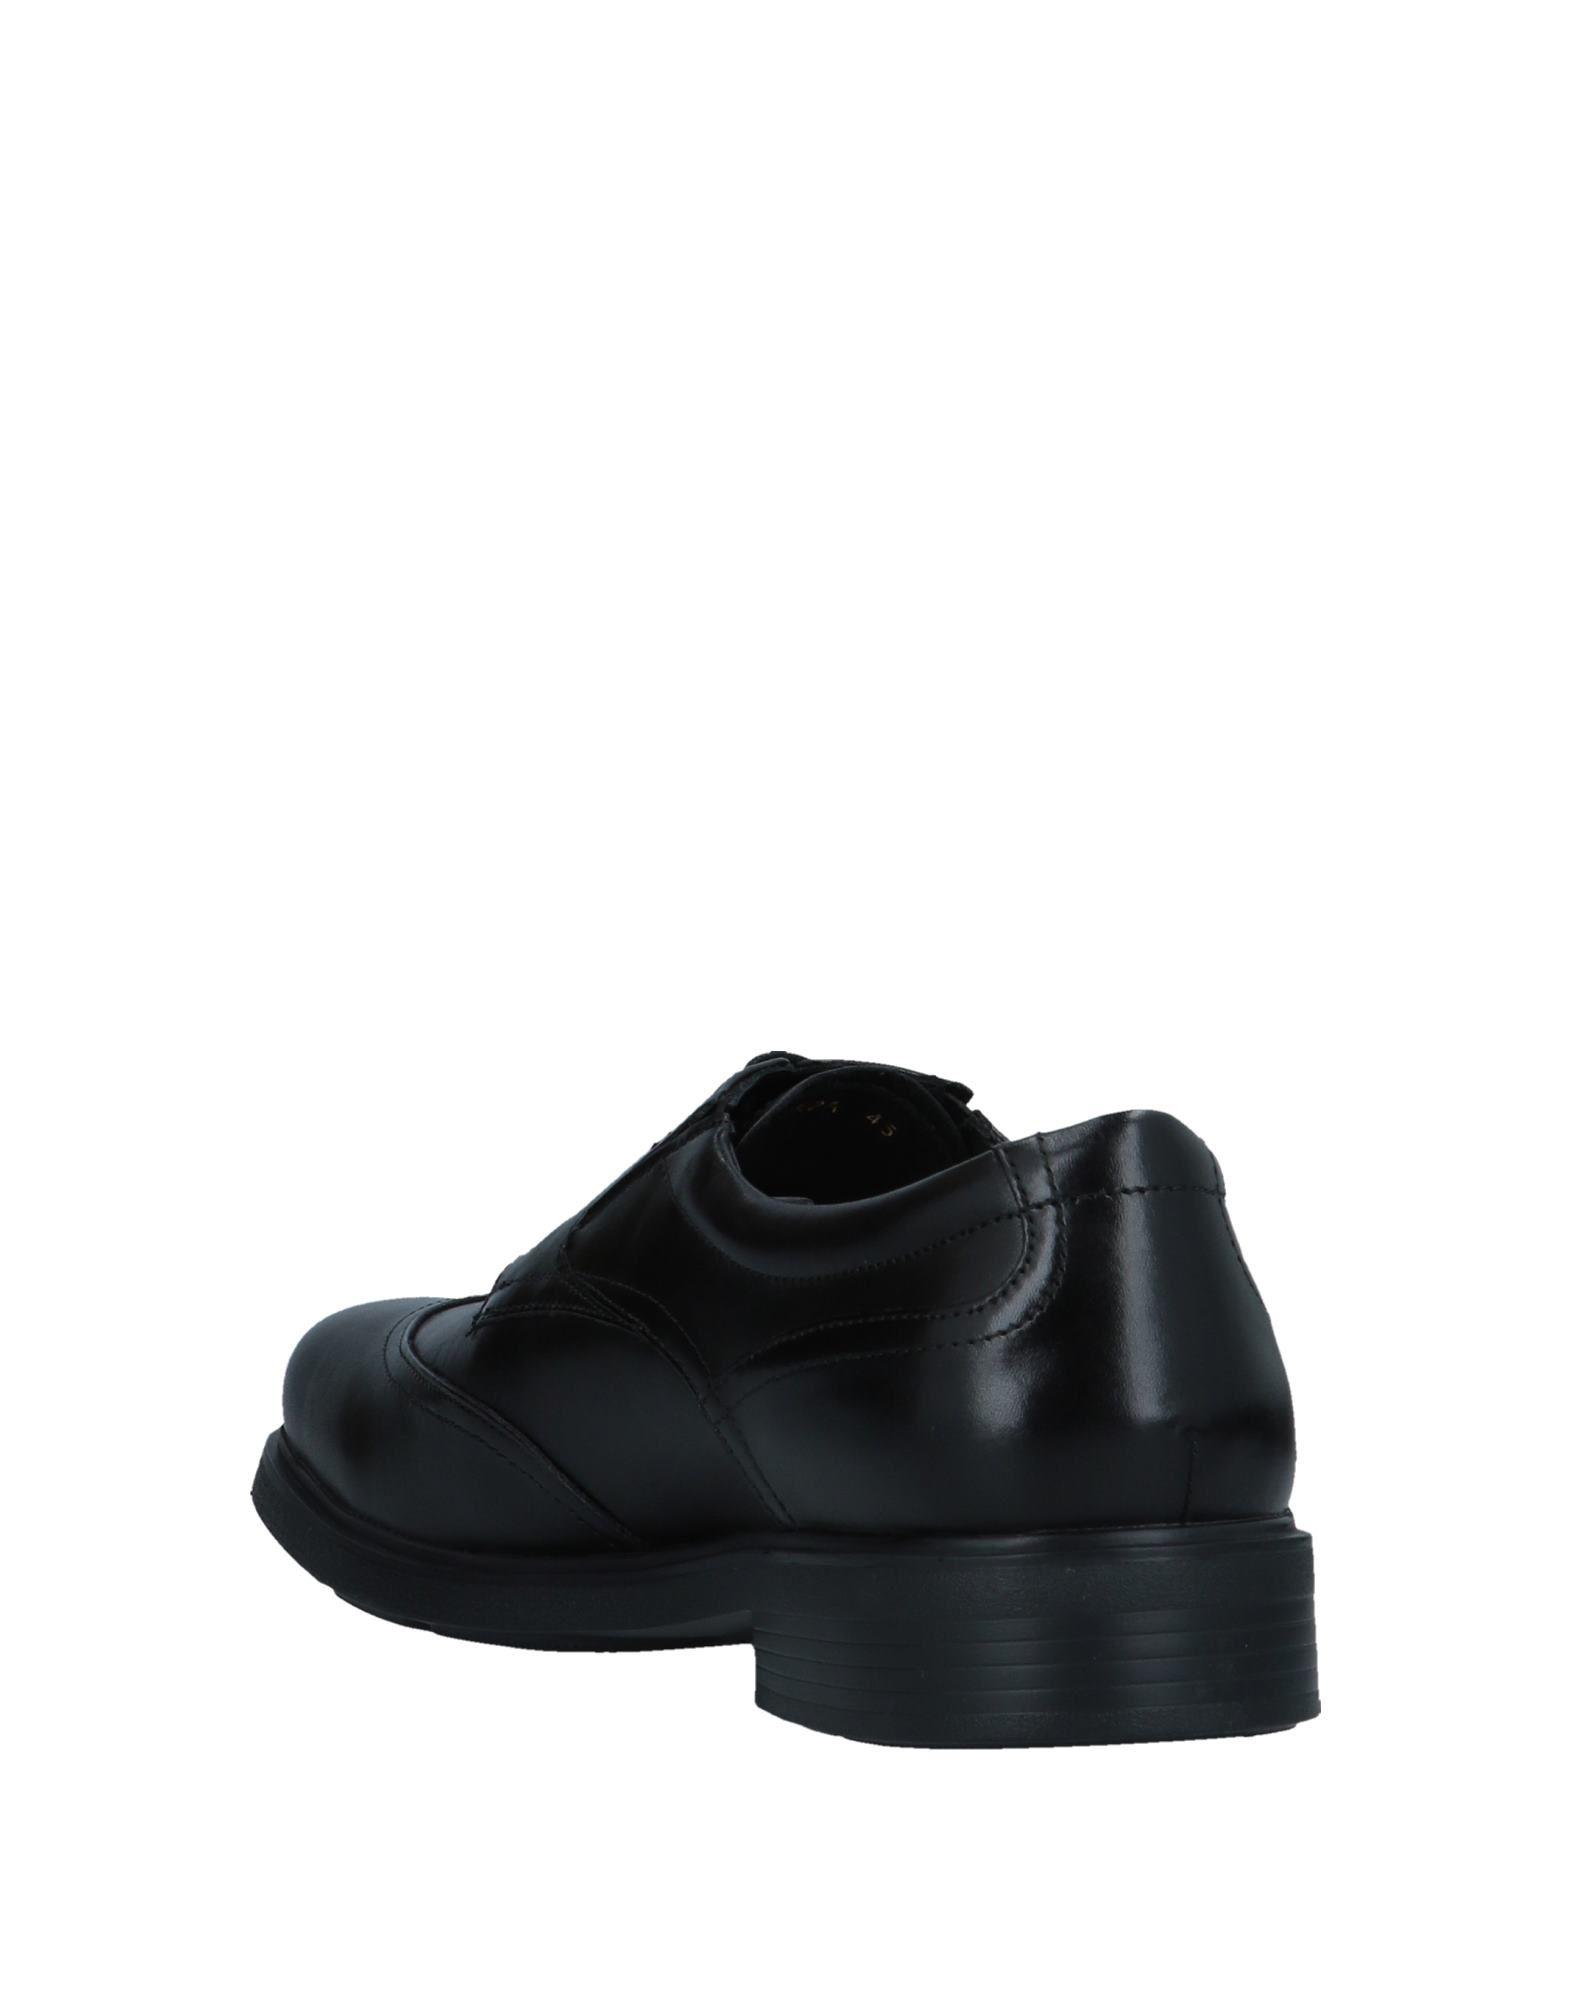 Rabatt Geox echte Schuhe Geox Rabatt Schnürschuhe Herren  11540558HQ 8e778b